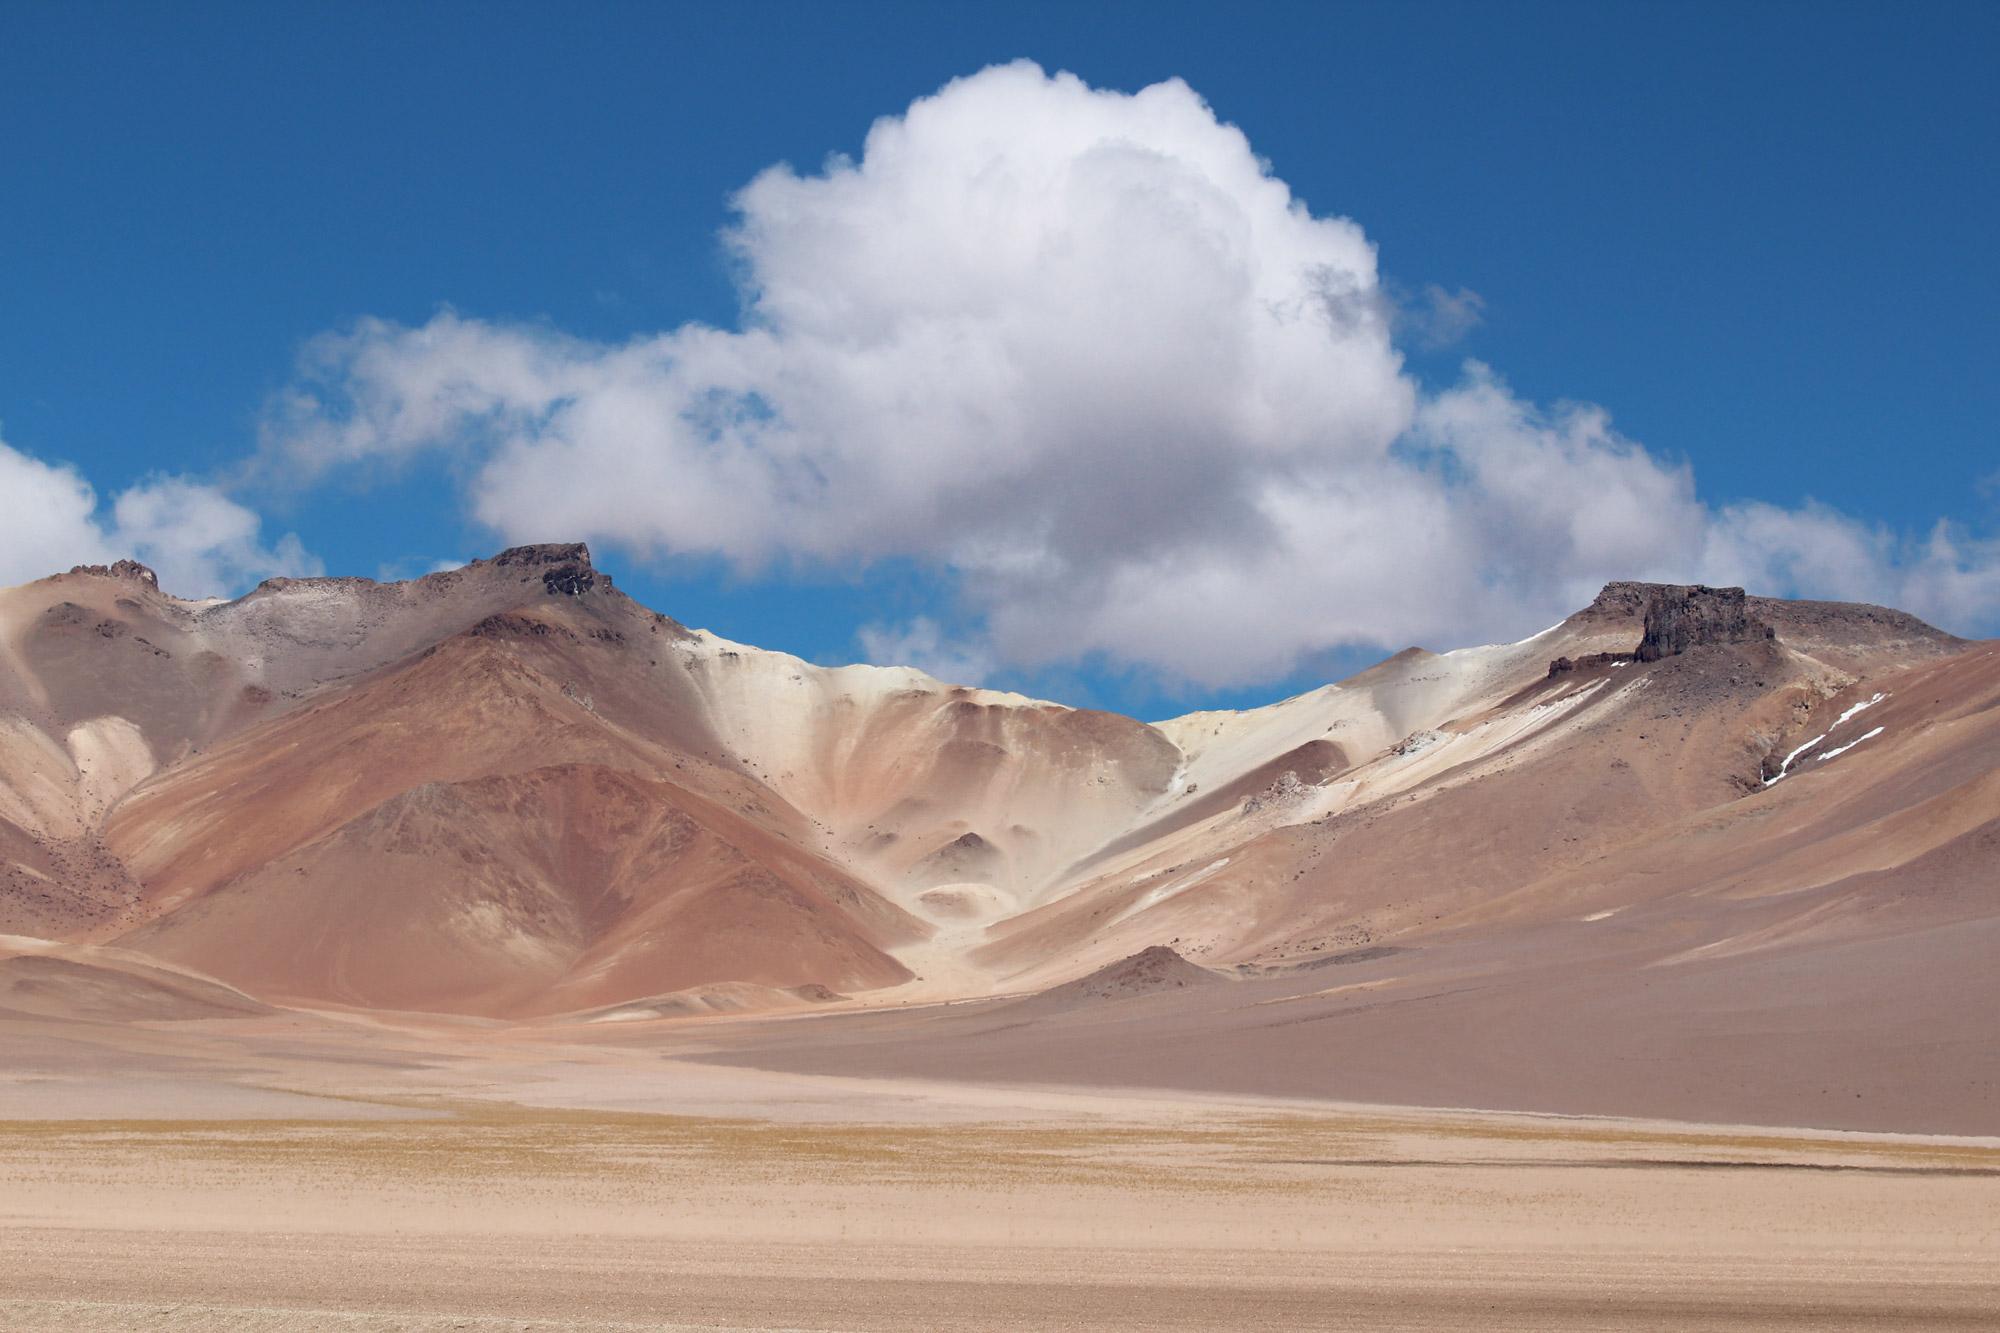 Bolivia 2016 - Dag 10 - Diesierto de Dali